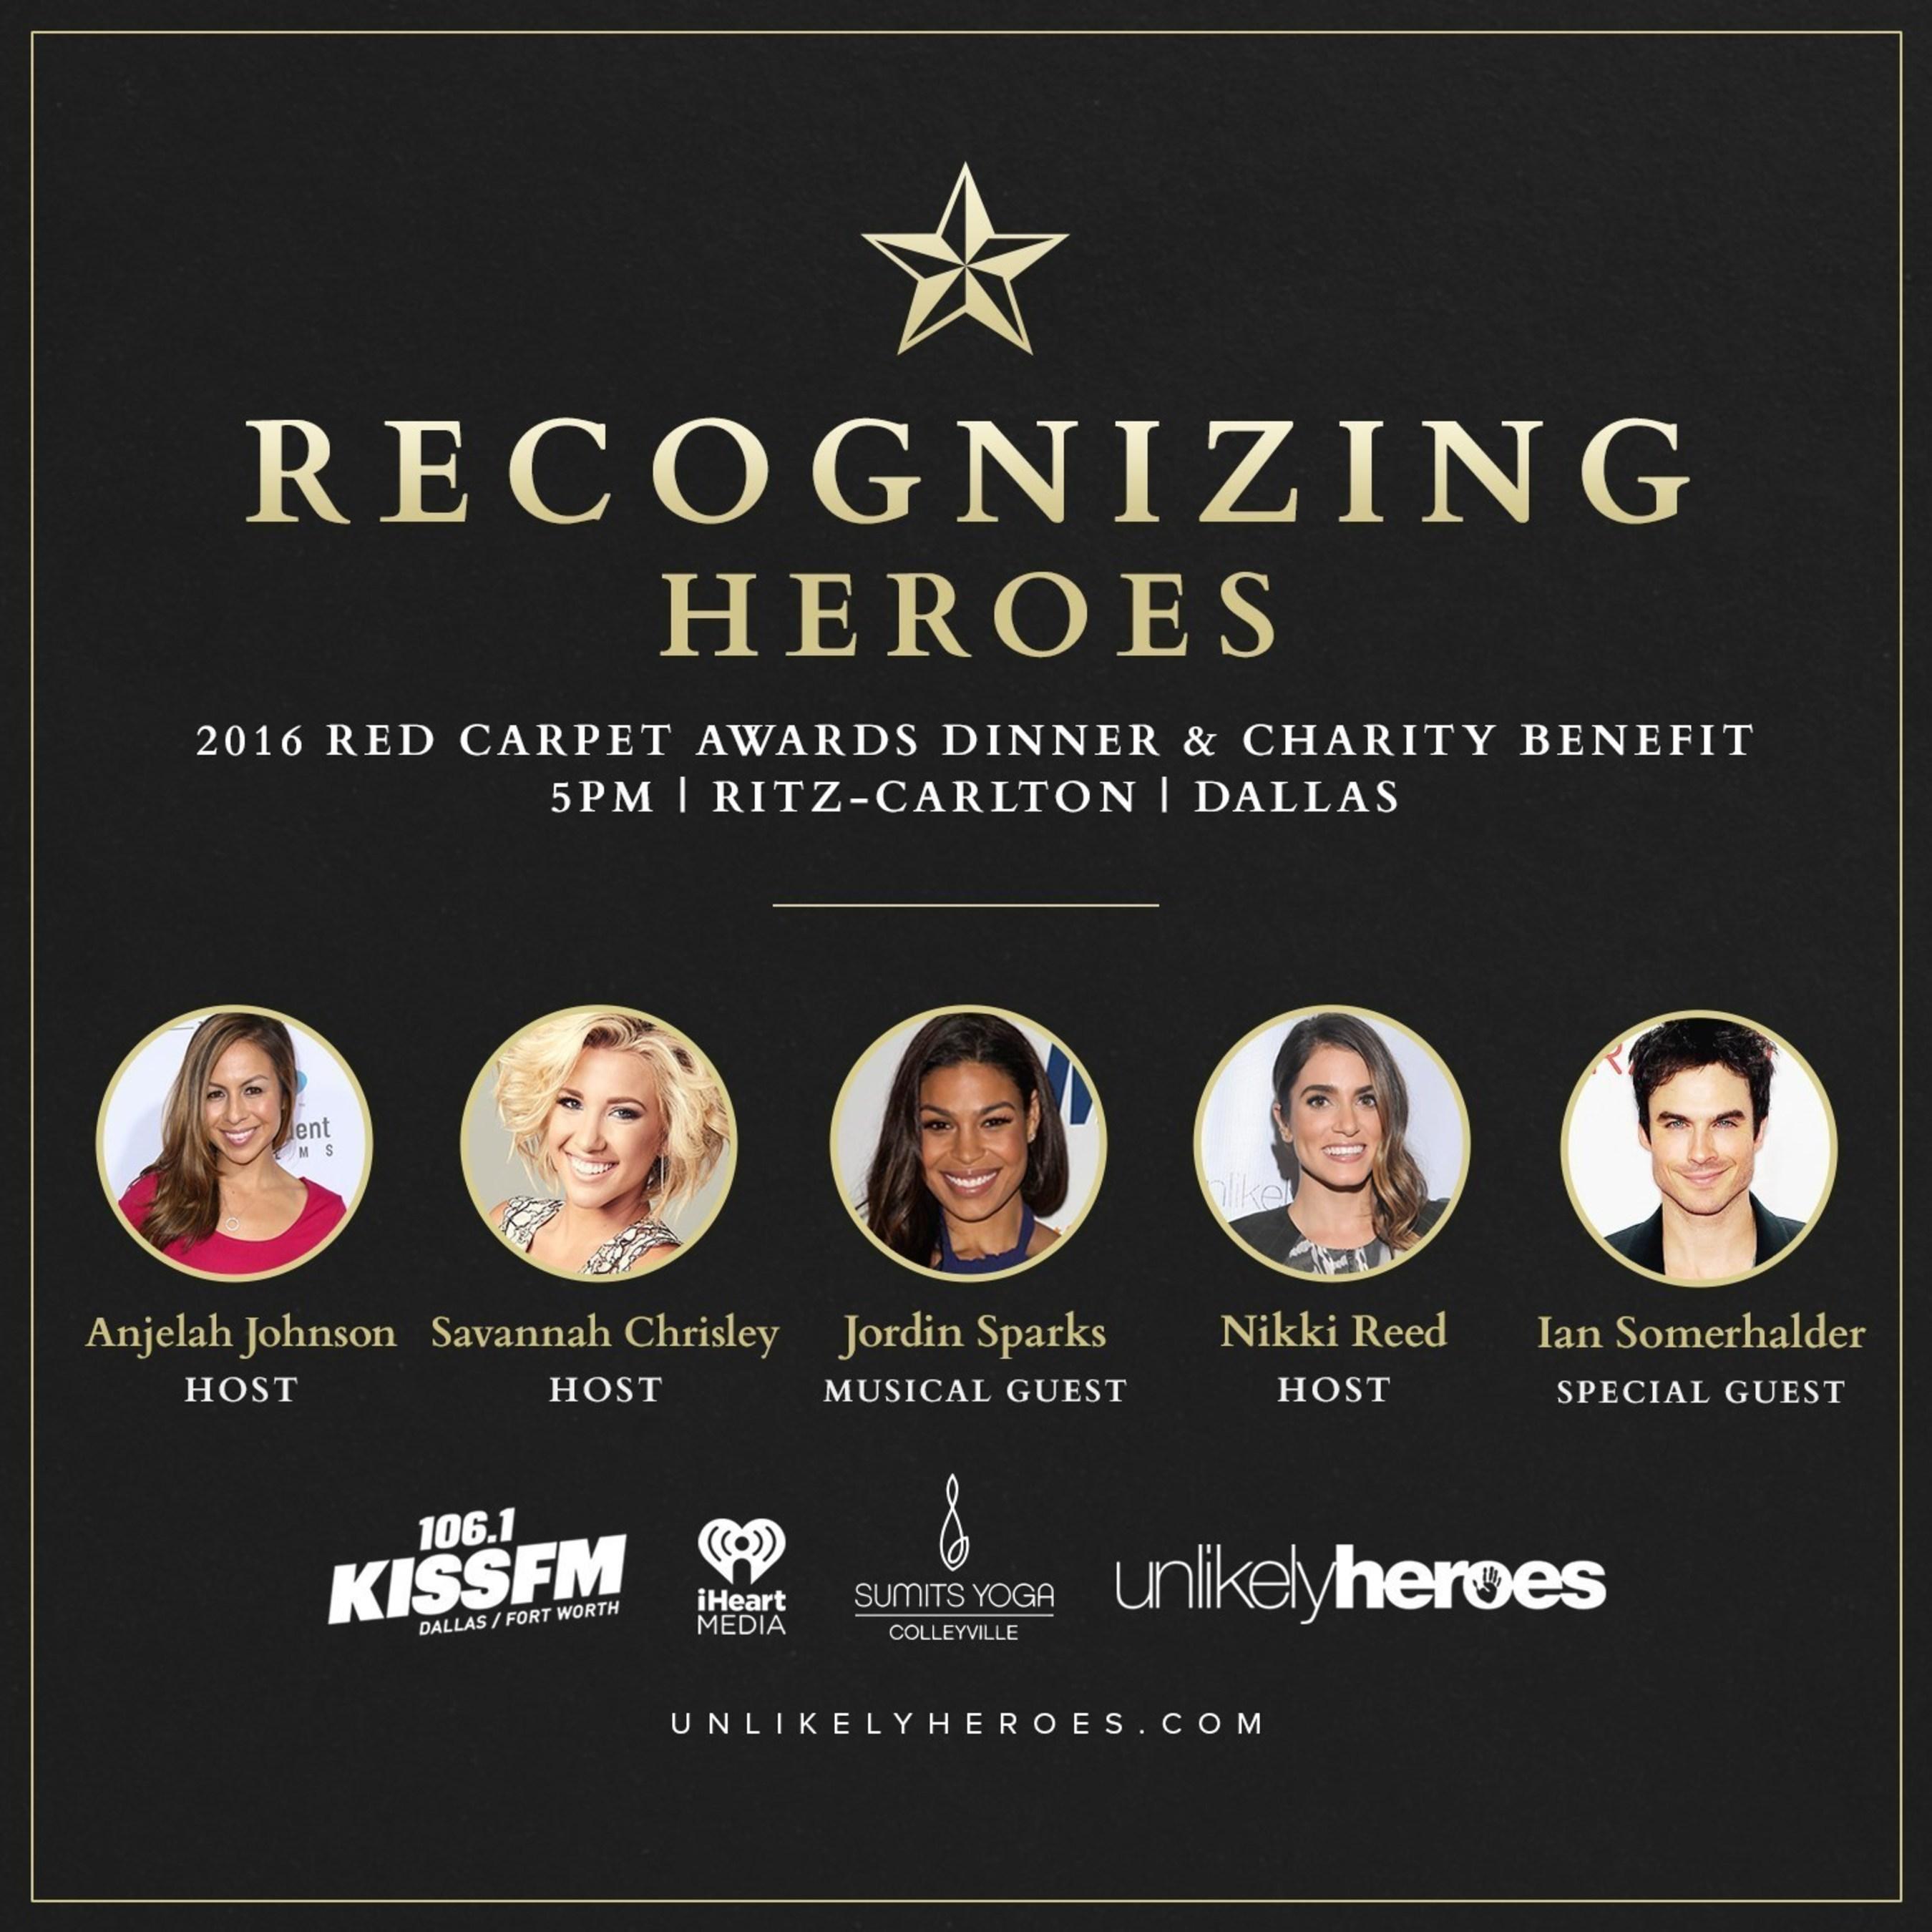 Unlikely Heroes Red Carpet Benefit Featuring Jordin Sparks, Nikki Reed, Anjelah Johnson